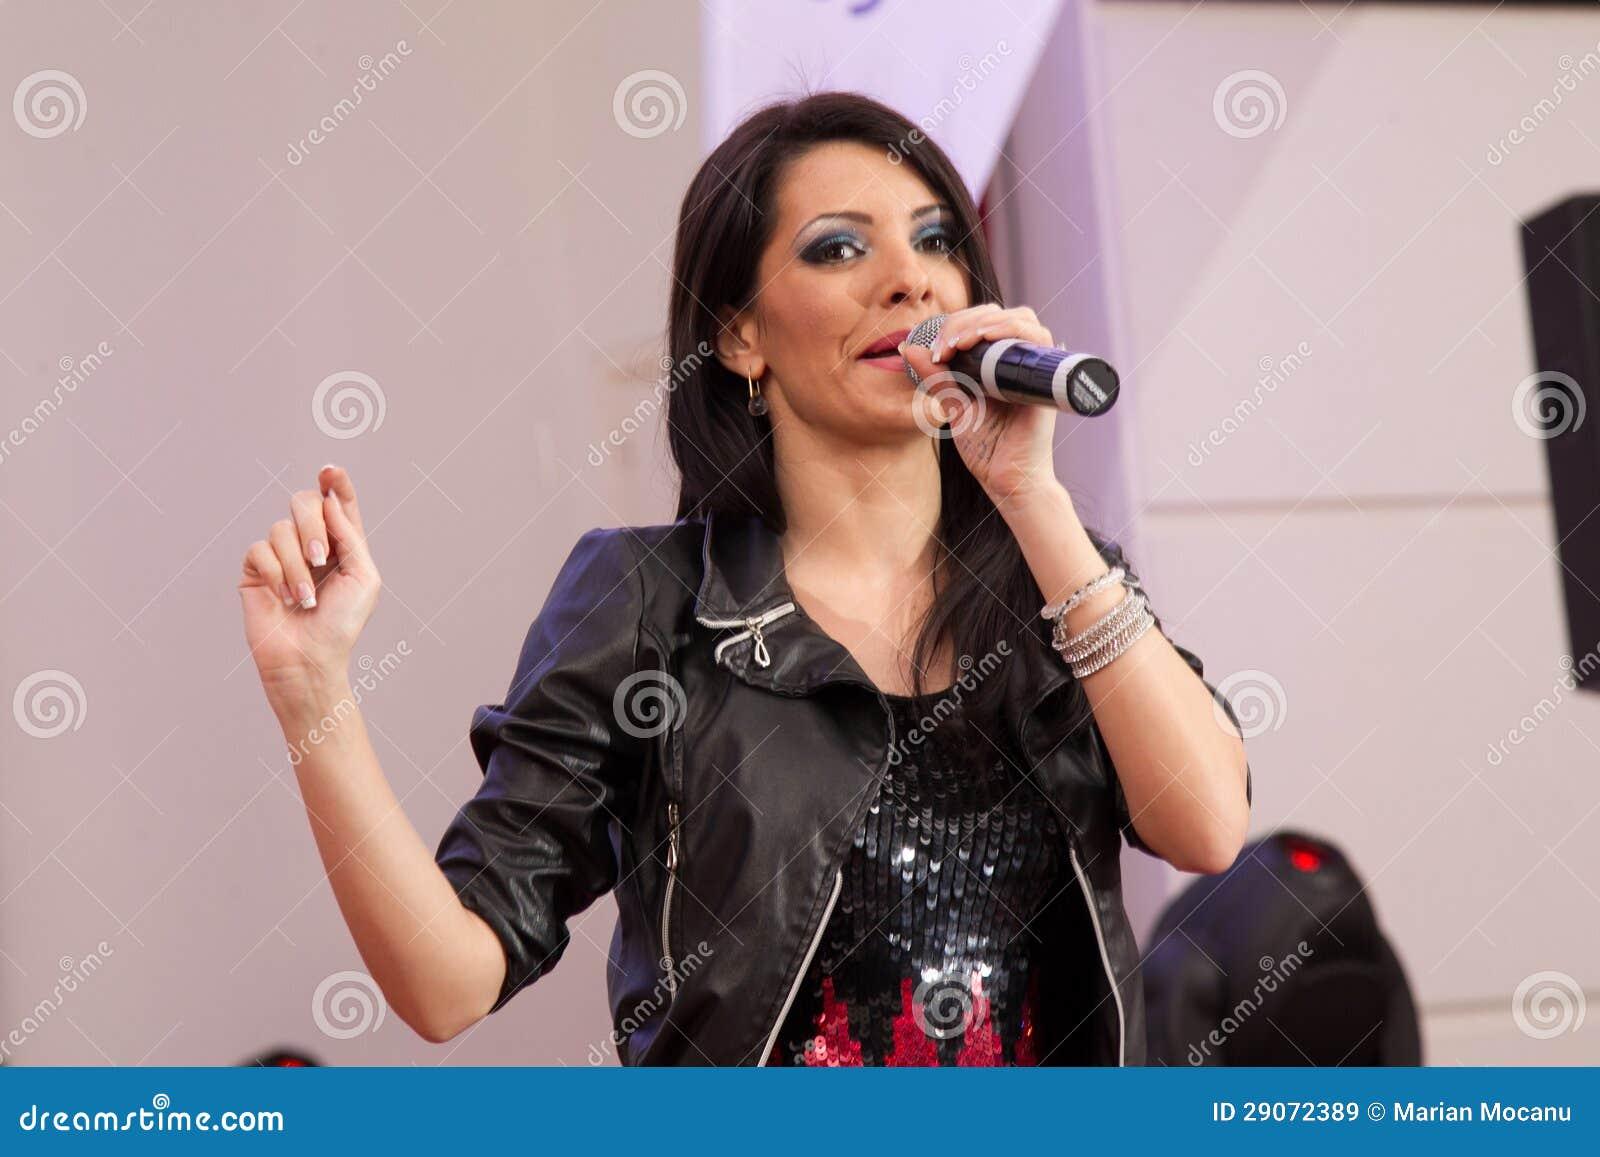 Cristina Ioana Socolan